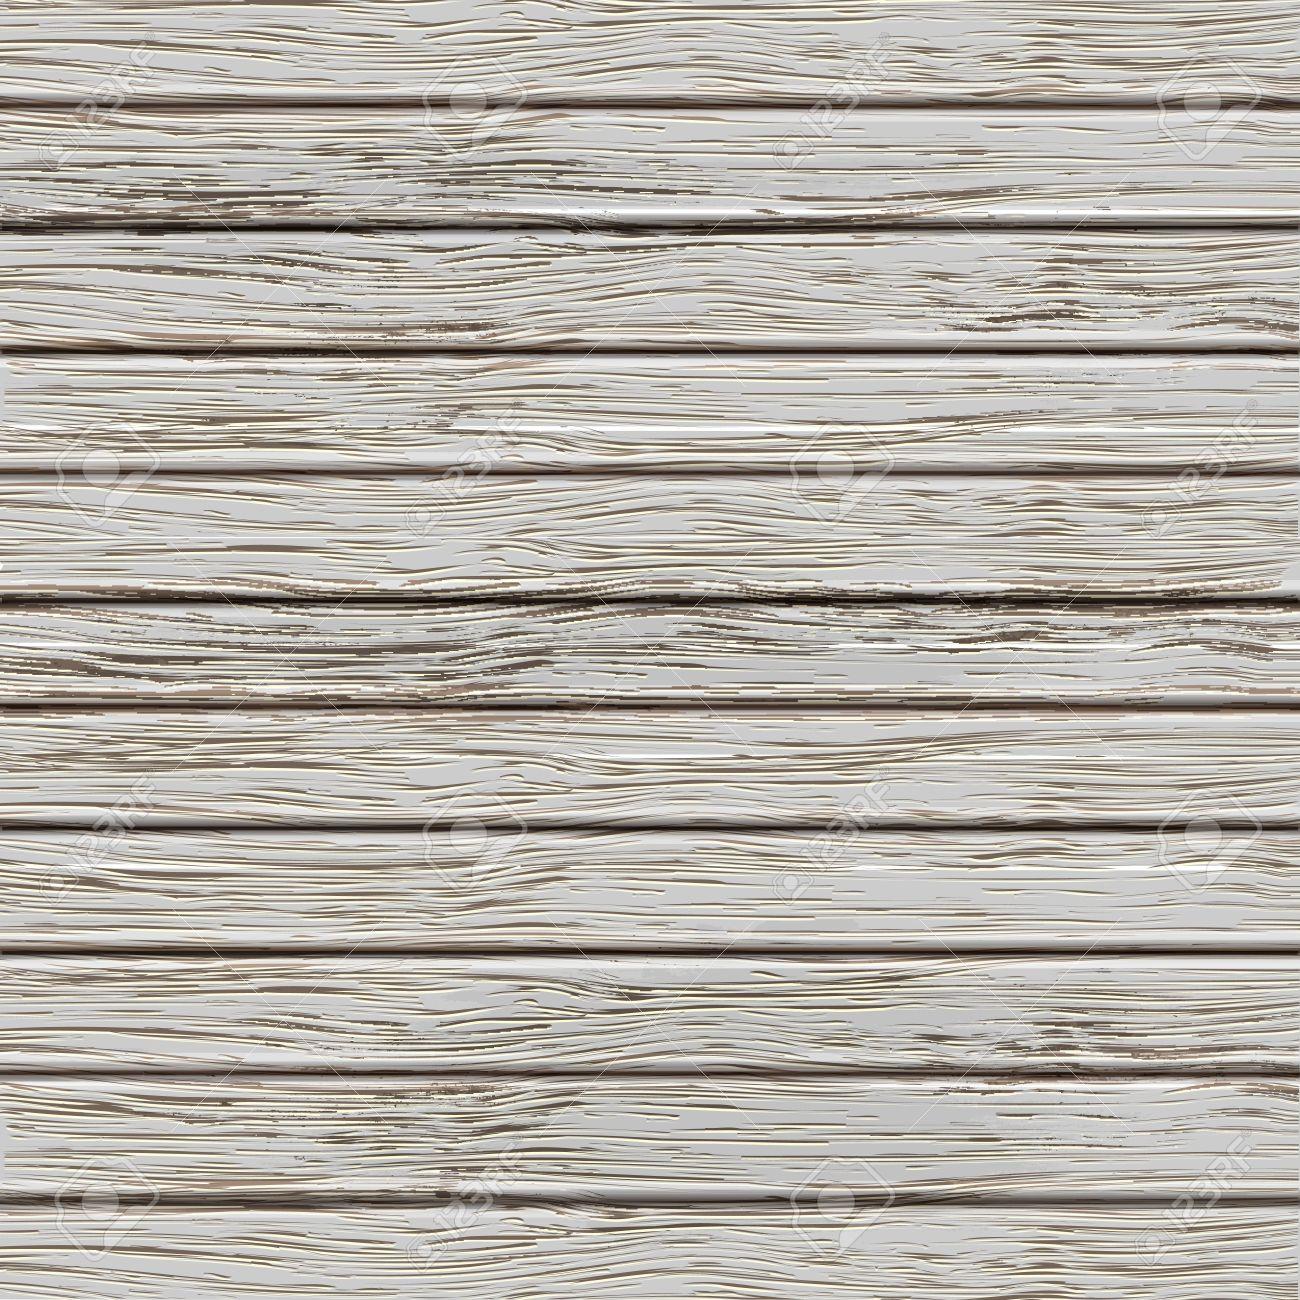 Grey old wooden texture. Vector illustration Stock Vector - 16238041